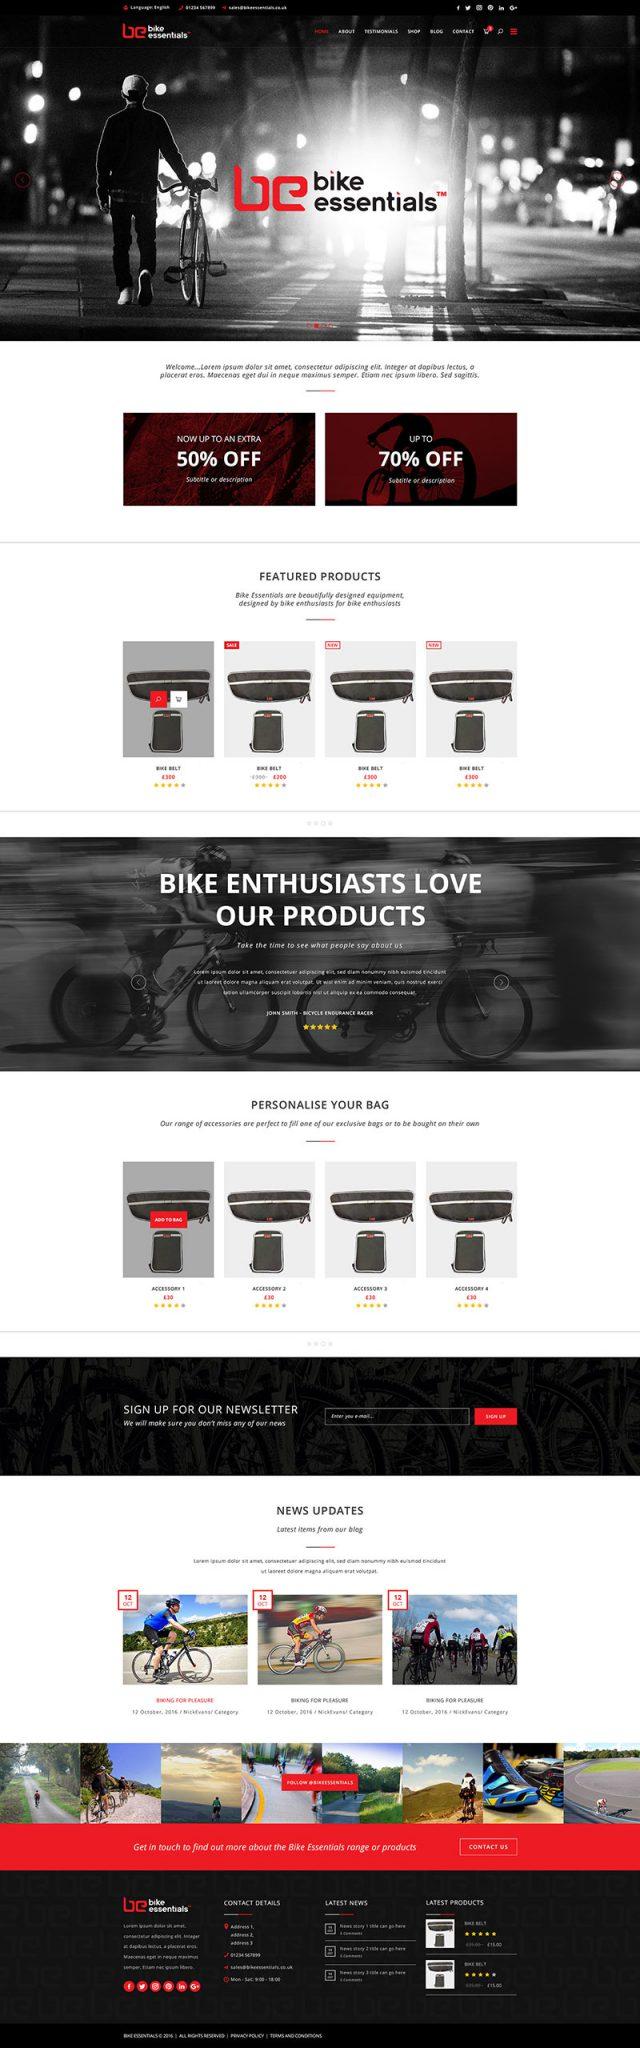 deon-design-bike-essentials-website-design2